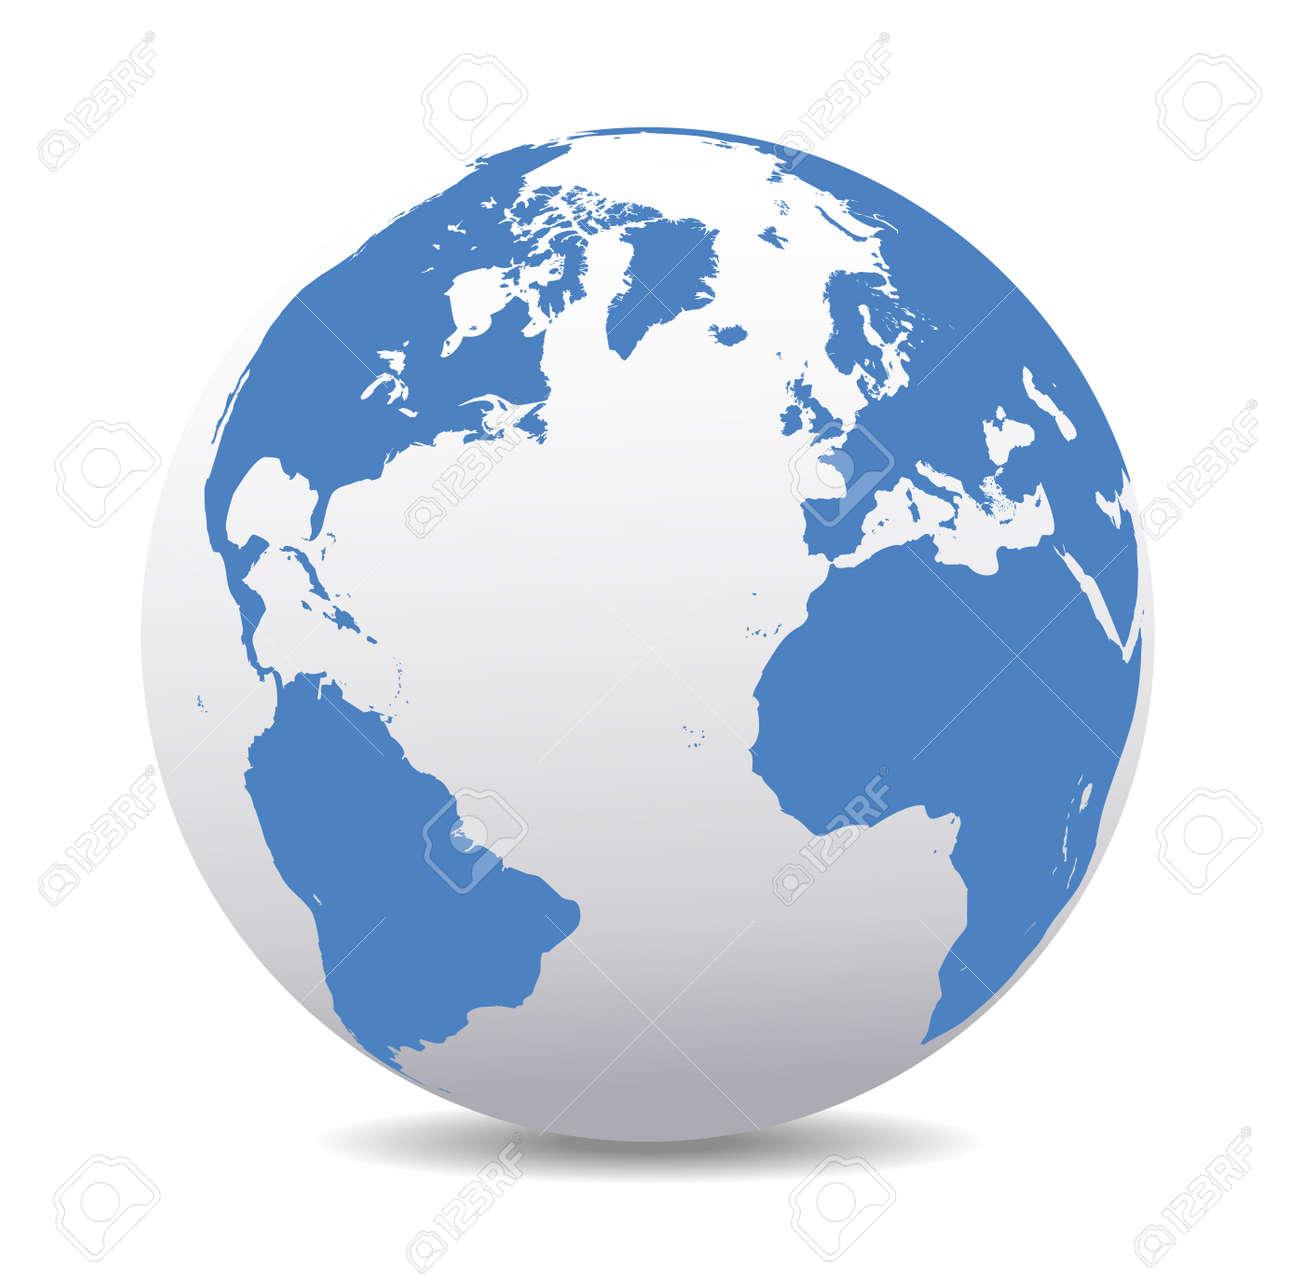 Europe, North, South America, Africa Global World - 33238194